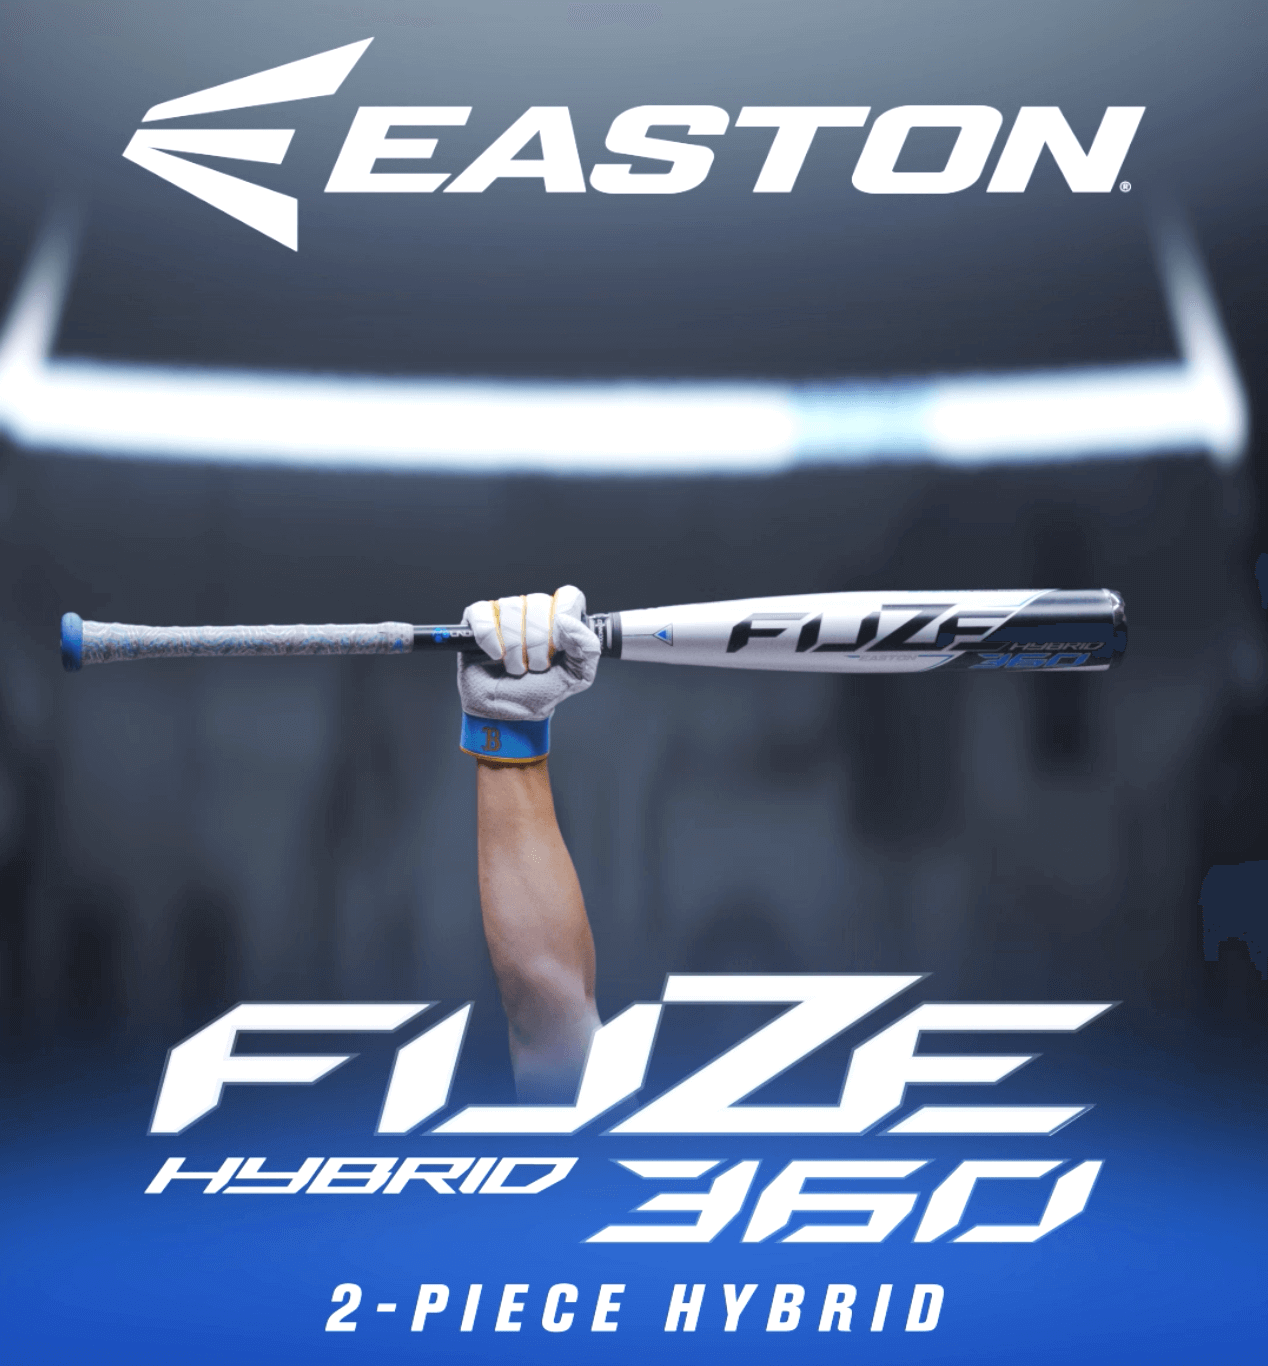 Easton Fuze